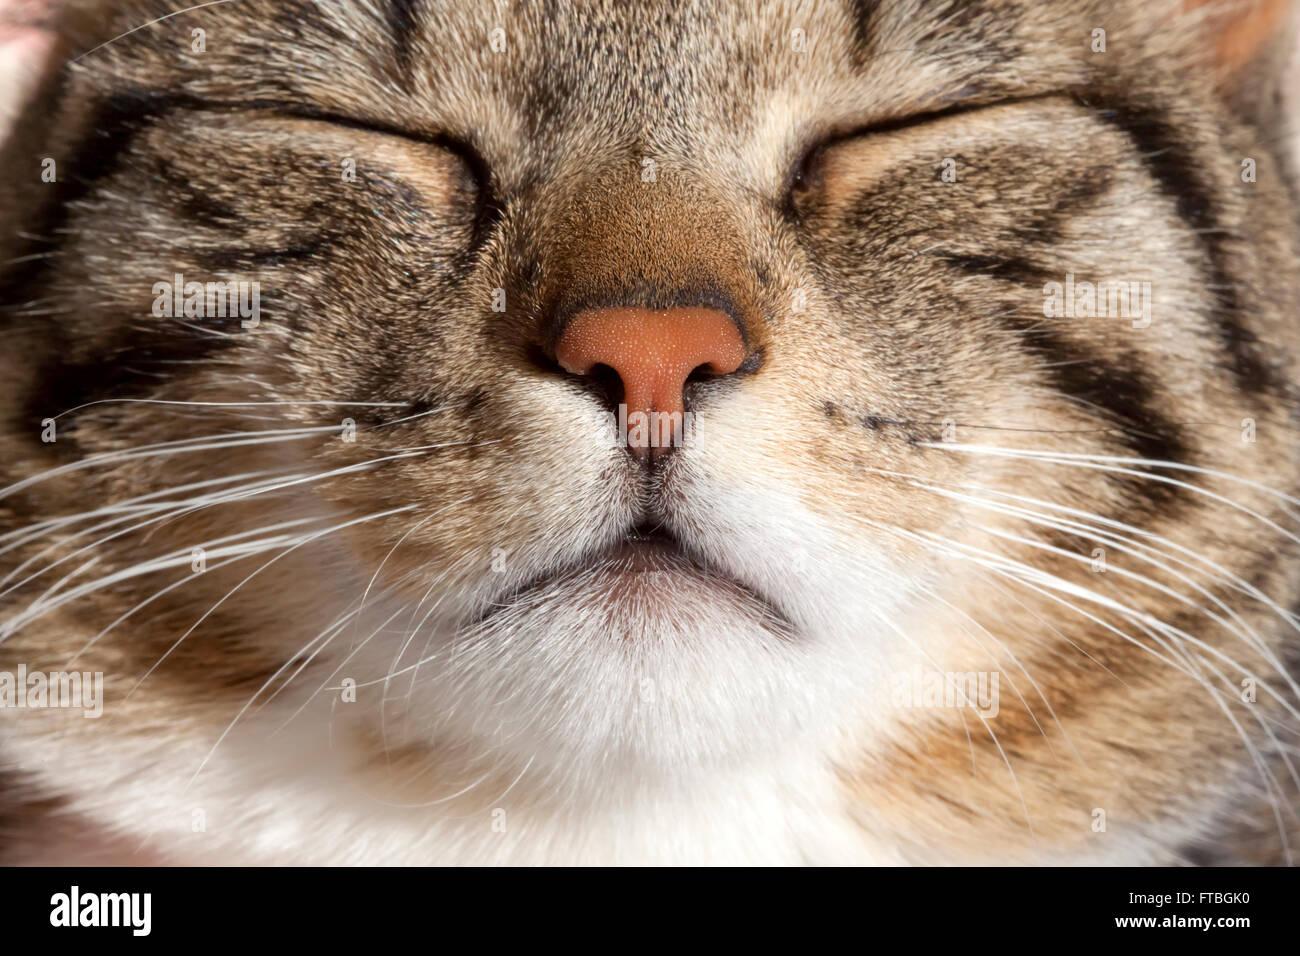 Domestic Cat, sleeping, portrait - Stock Image